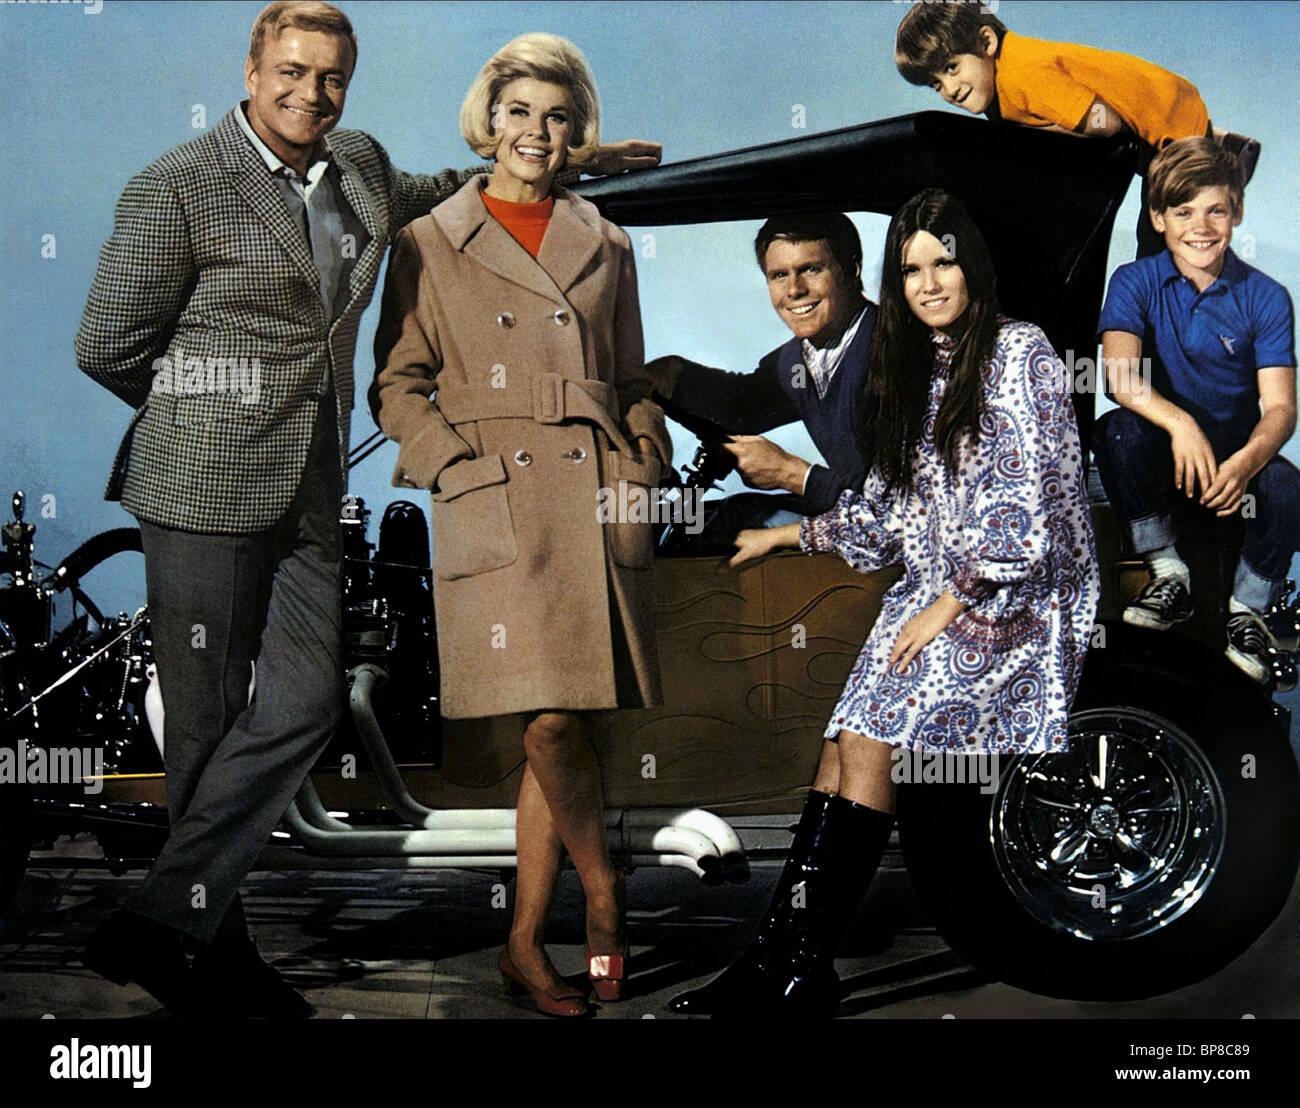 BRIAN KEITH DORIS DAY JOHN FINDLATER BARBARA HERSHEY RICHARD S. STEEL JIMMY BRACKEN WITH SIX YOU GET EGGROLL (1968) Stock Photo